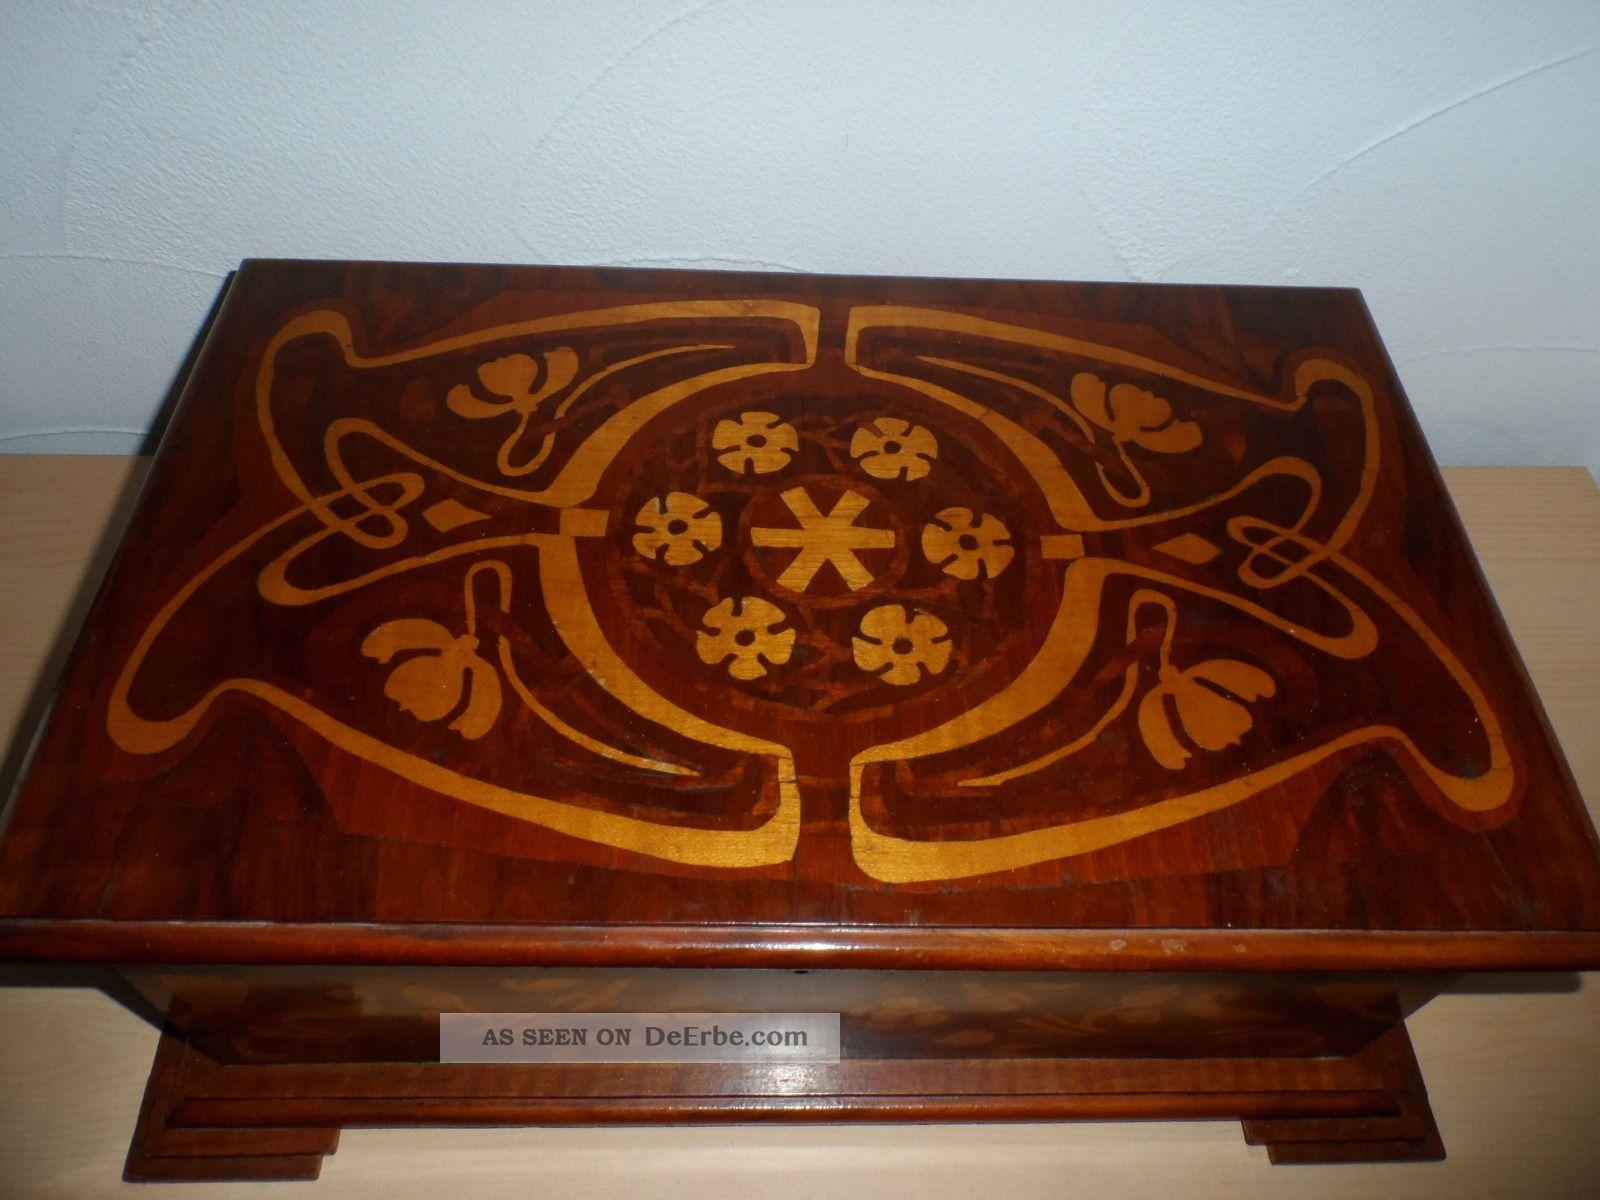 gro e holztruhe antik holzkiste intarsien schatzkiste. Black Bedroom Furniture Sets. Home Design Ideas